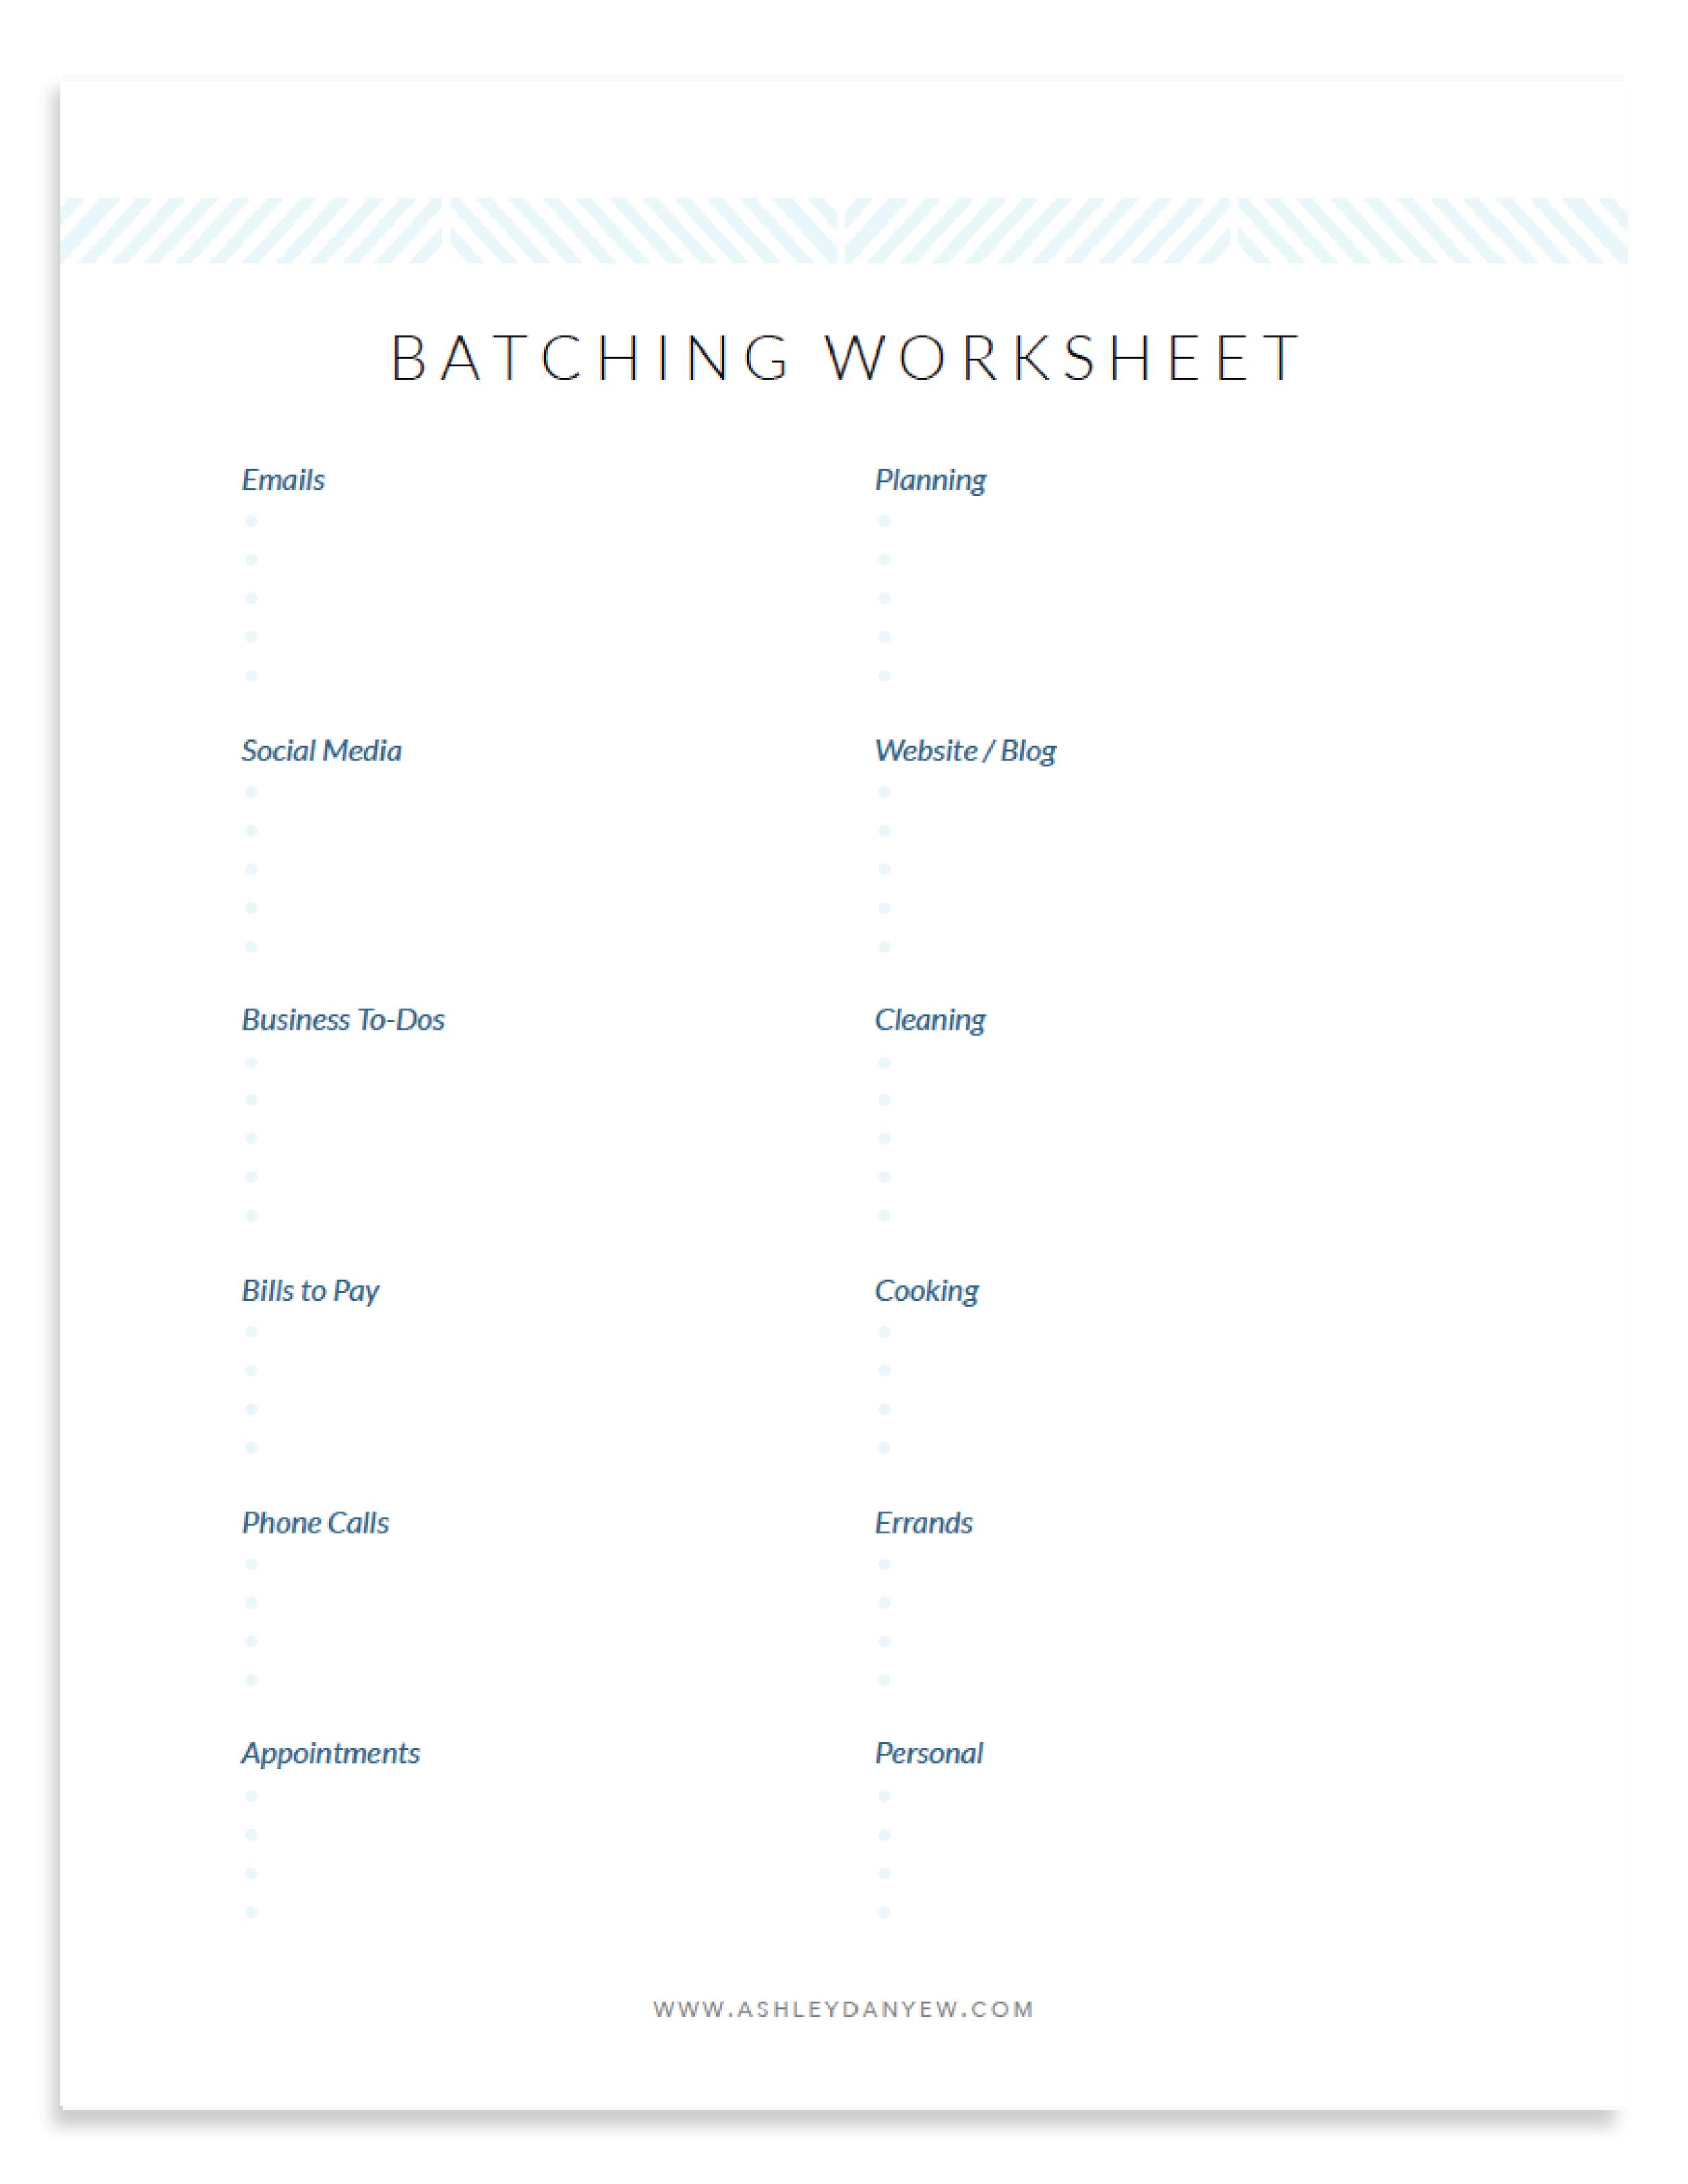 Free Batching Worksheet for Freelancers by Ashley Danyew